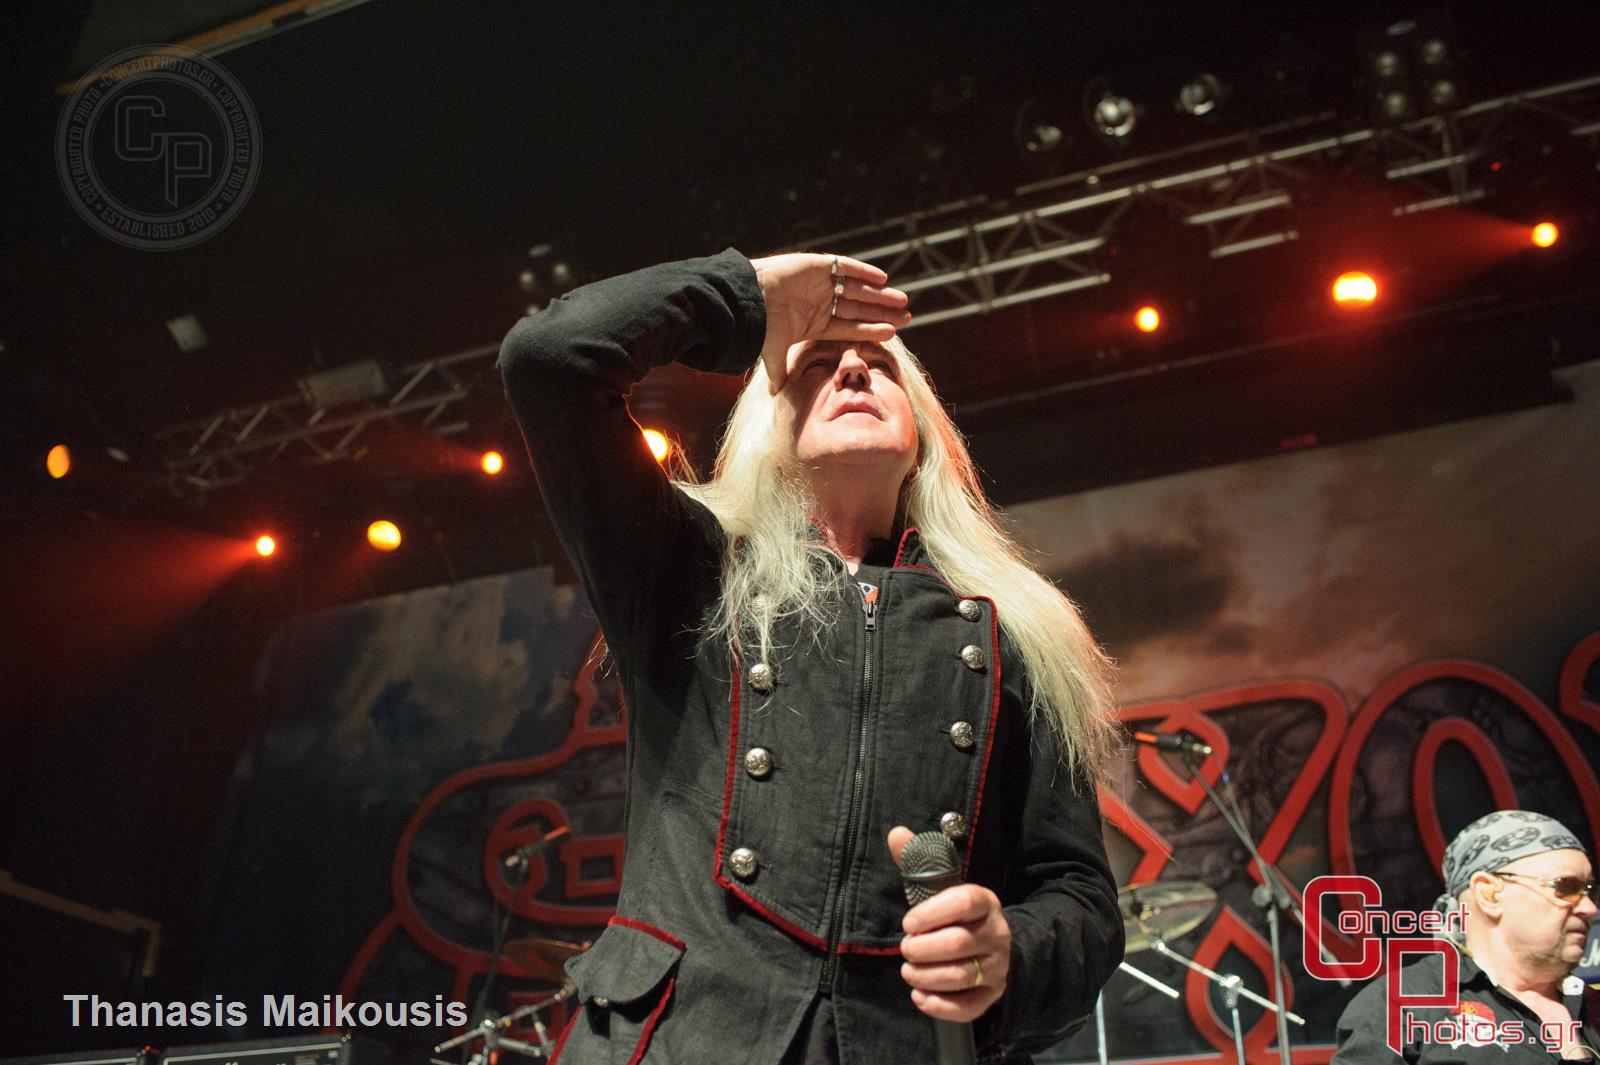 Saxon & Innerwish -Saxon Innerwish Gagarin photographer: Thanasis Maikousis - concertphotos_20141025_22_26_12